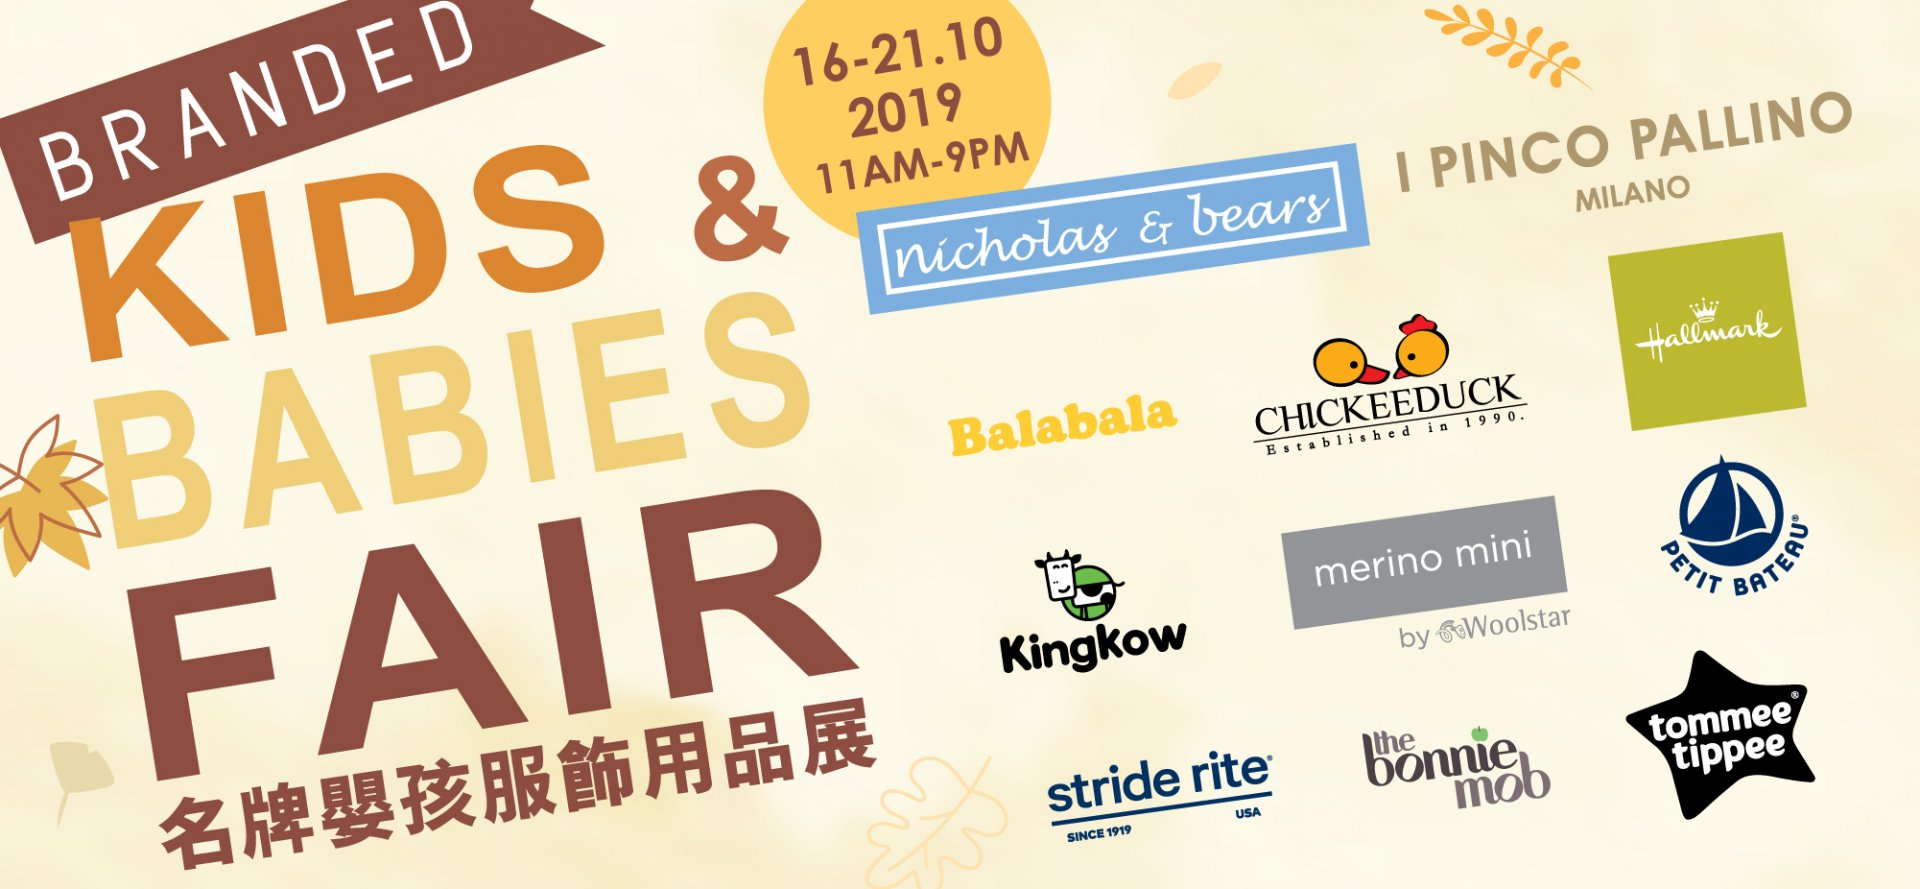 Branded Kids & Babies Fair_16-21 Oct 2019